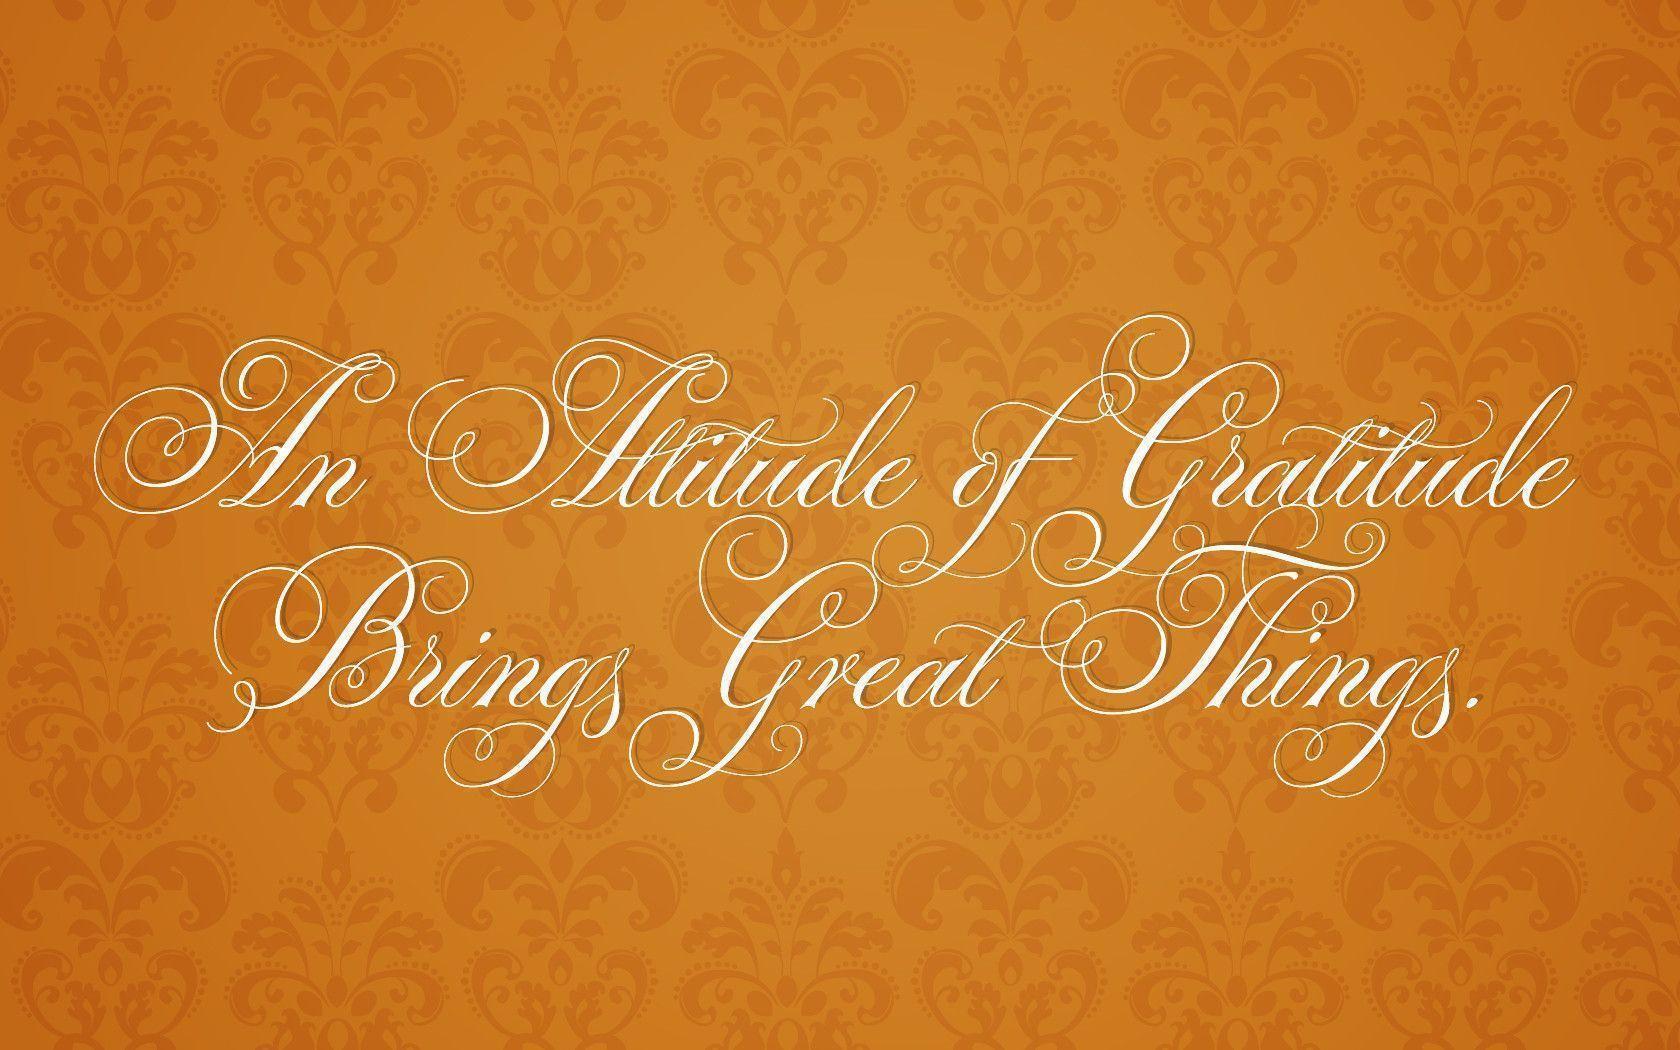 wednesday wallpaper gratitude brings - photo #25